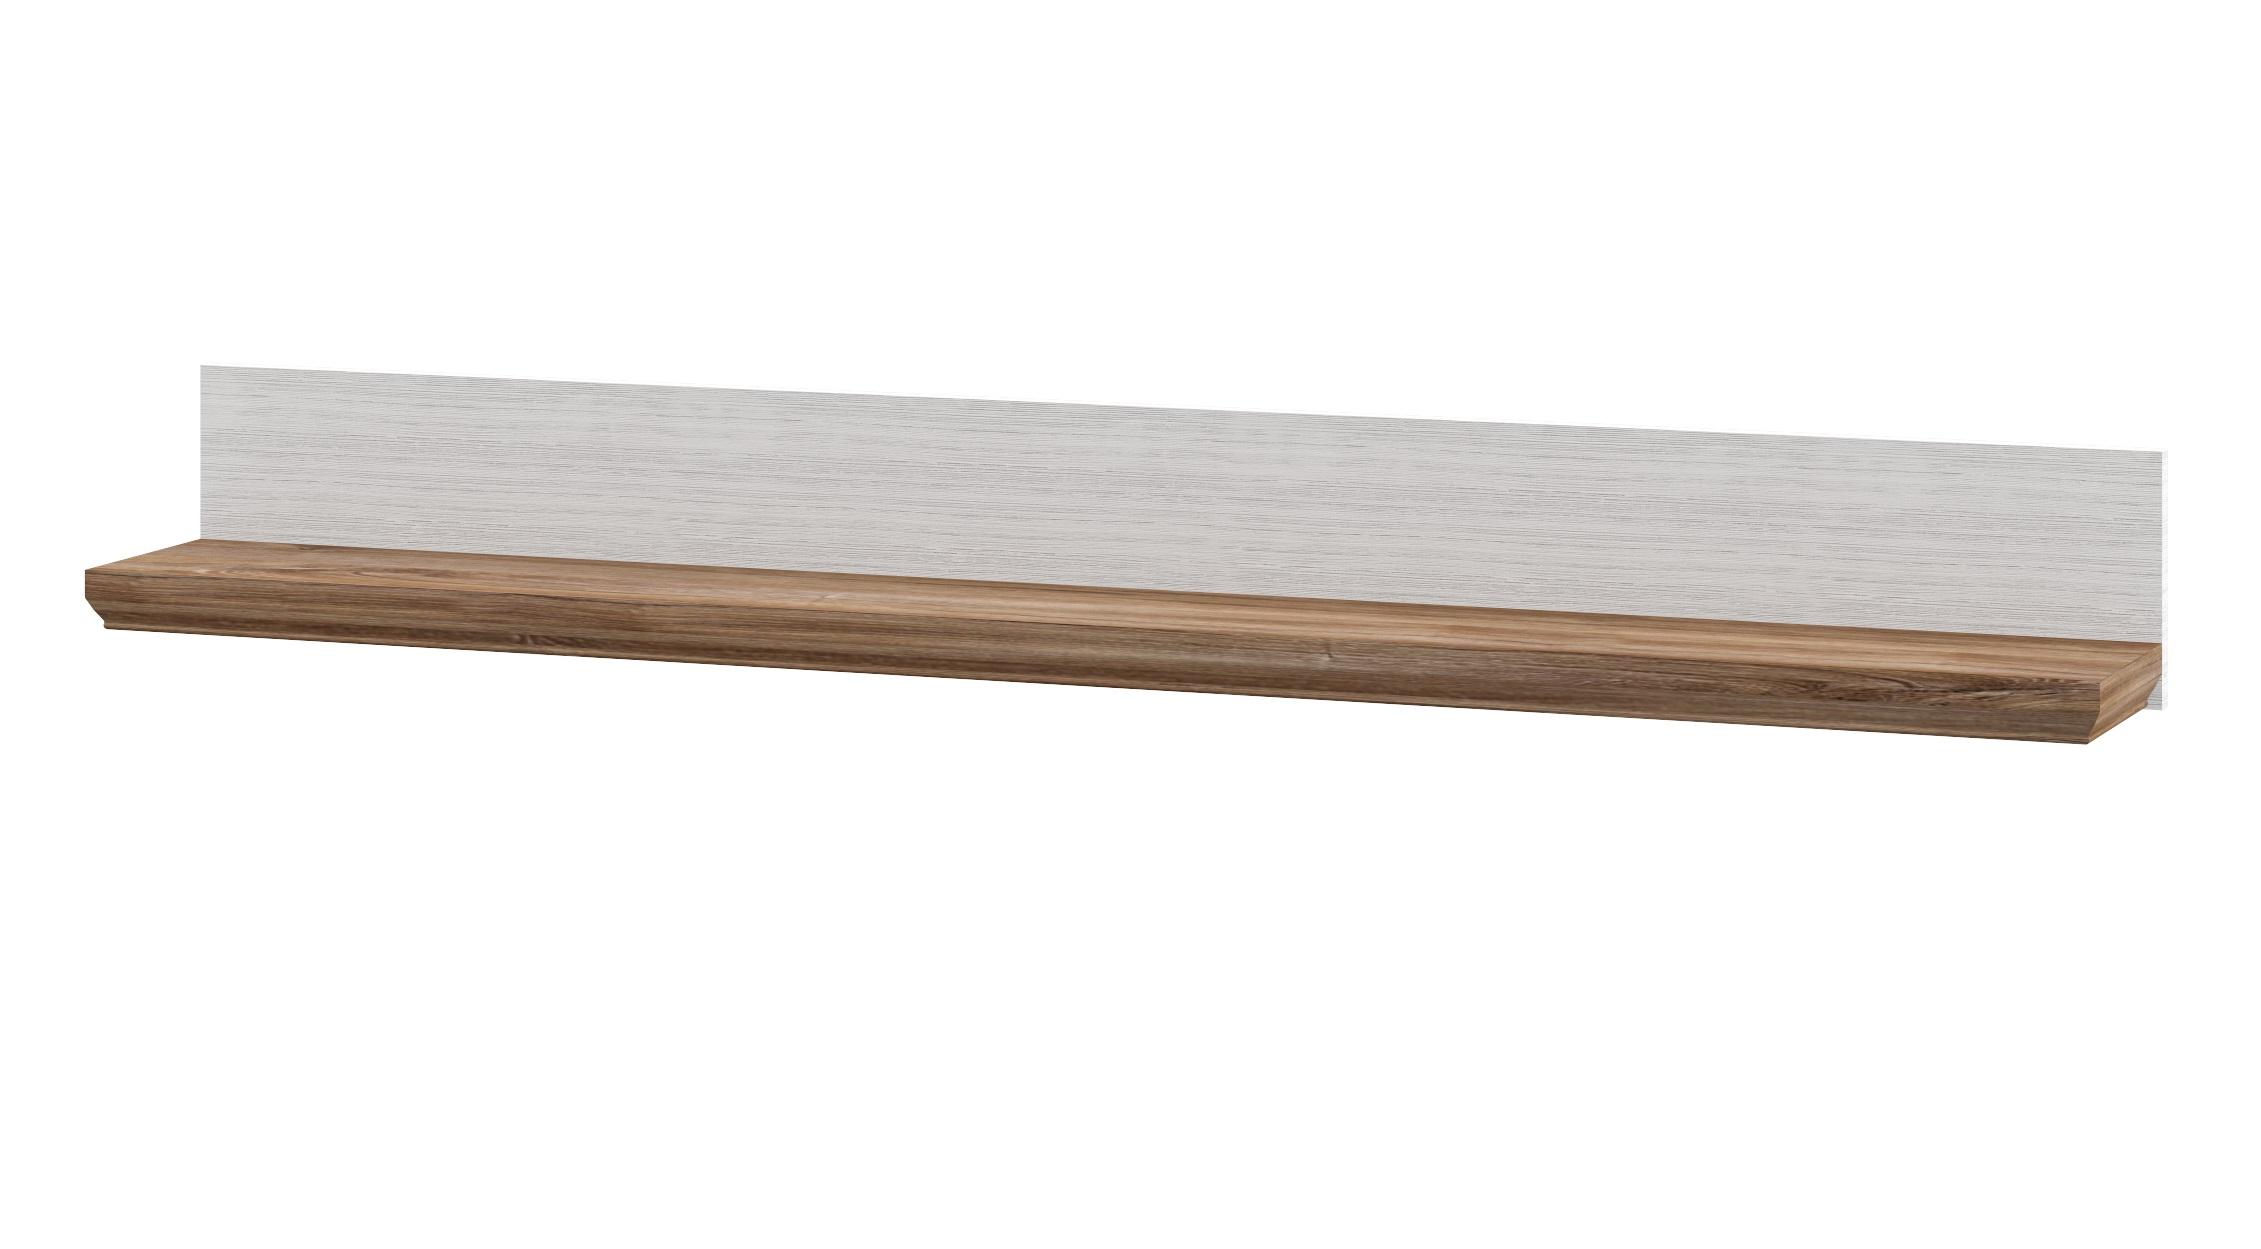 Neman Wandregal 138x16 cm Tivoli Landhausstil Weiß